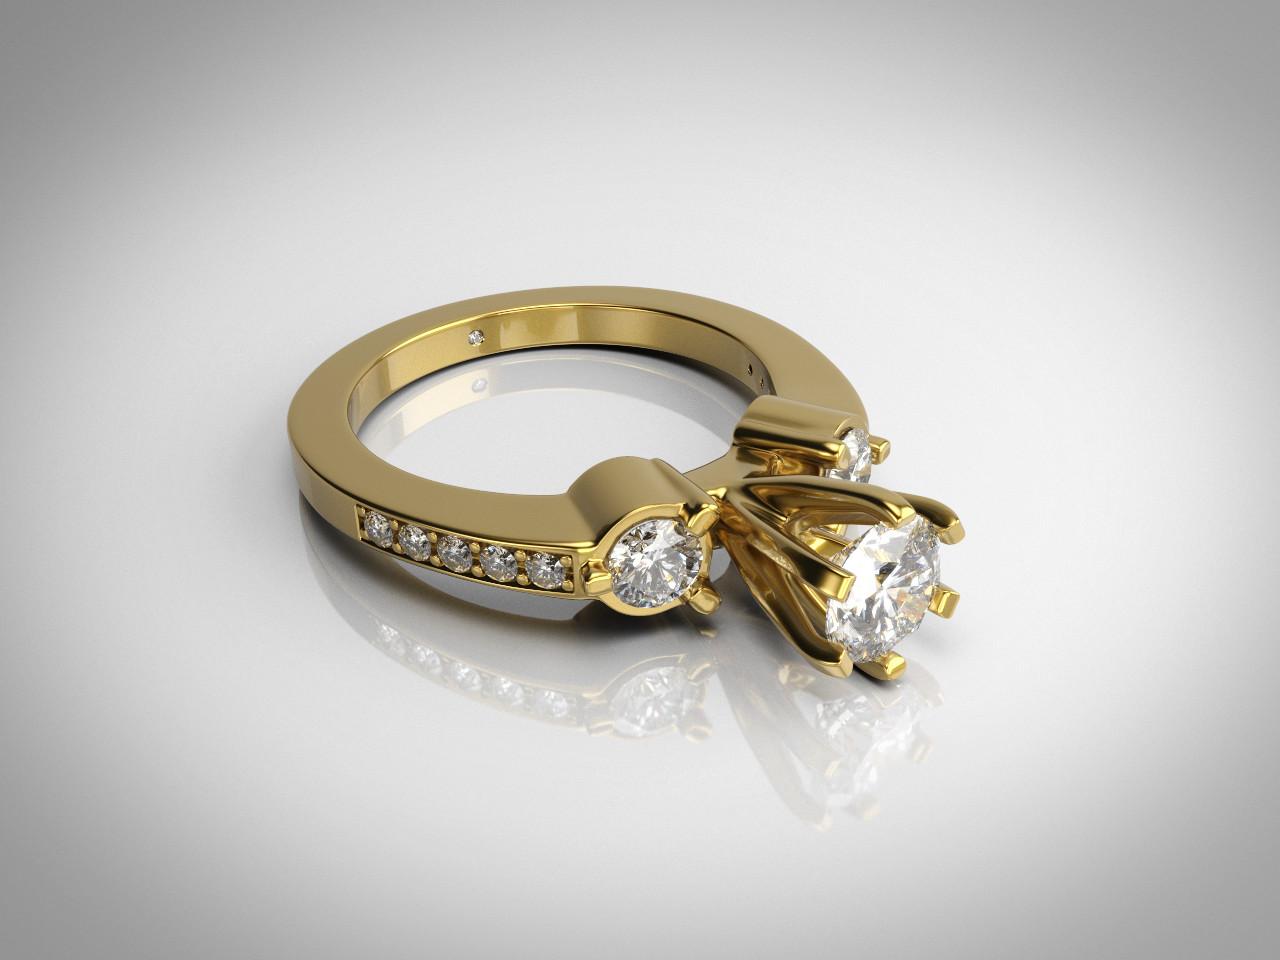 Nikolaos maragkos diamondring002